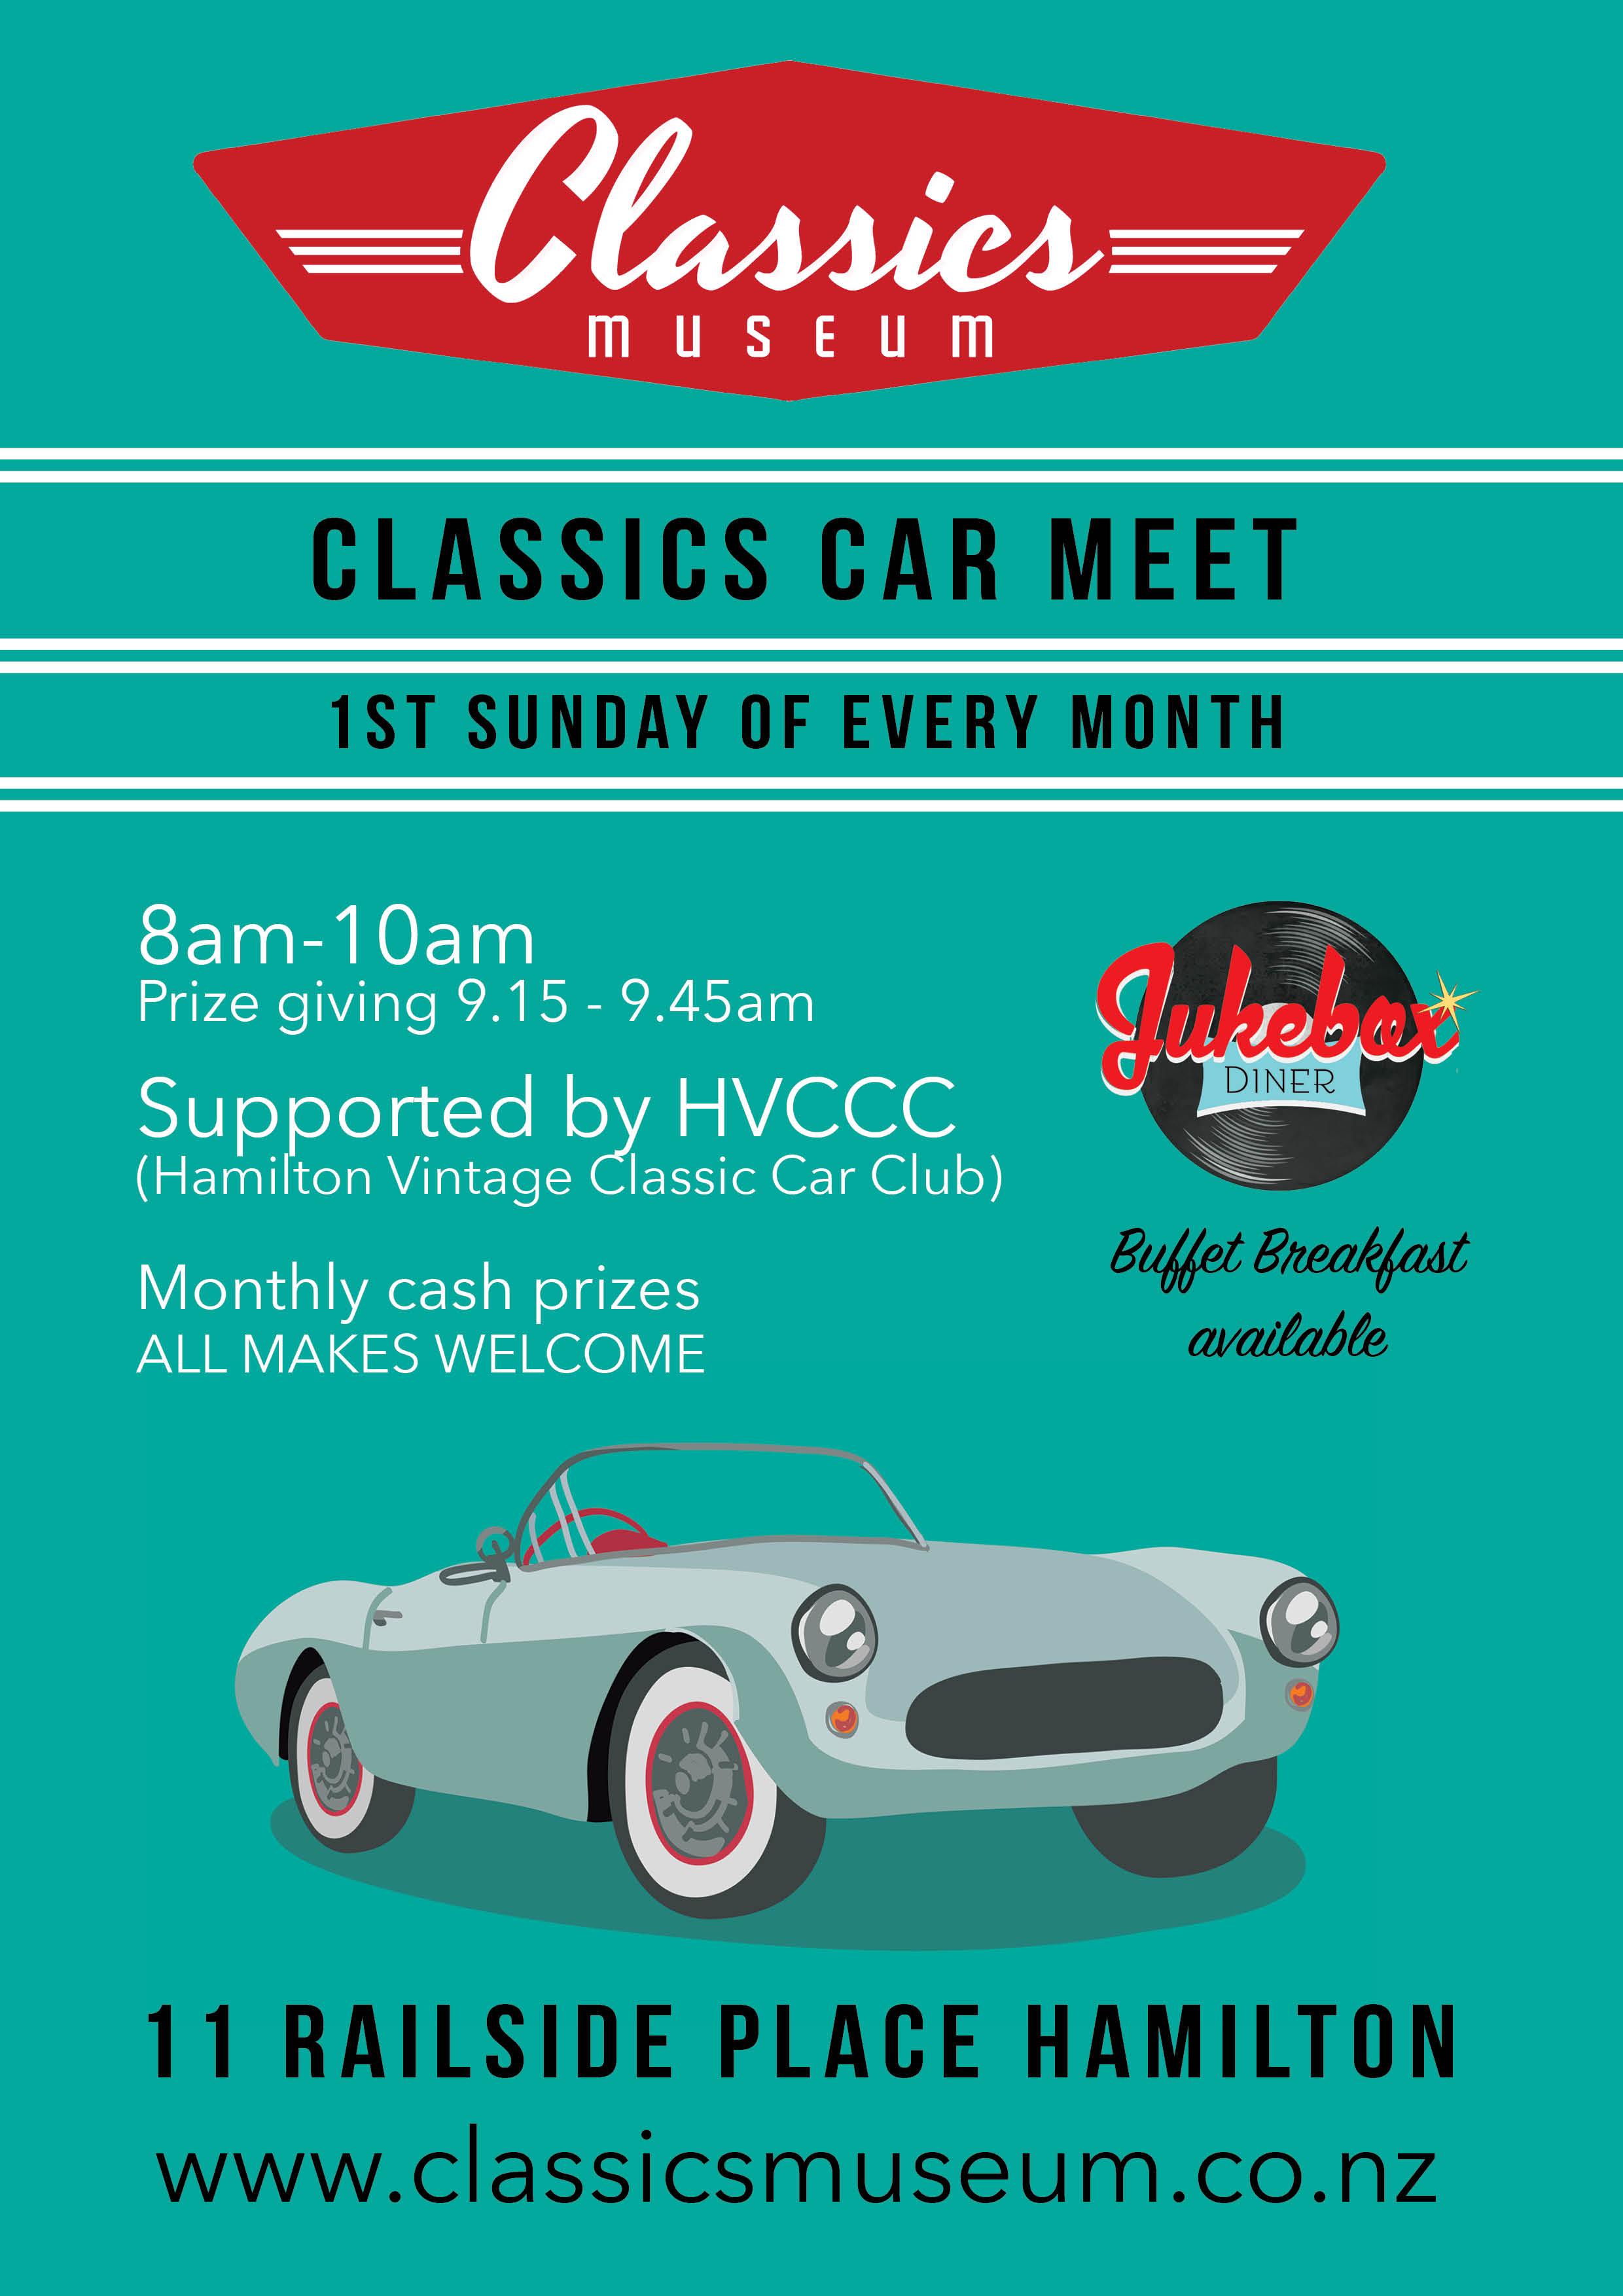 Classics car meet poster.jpg